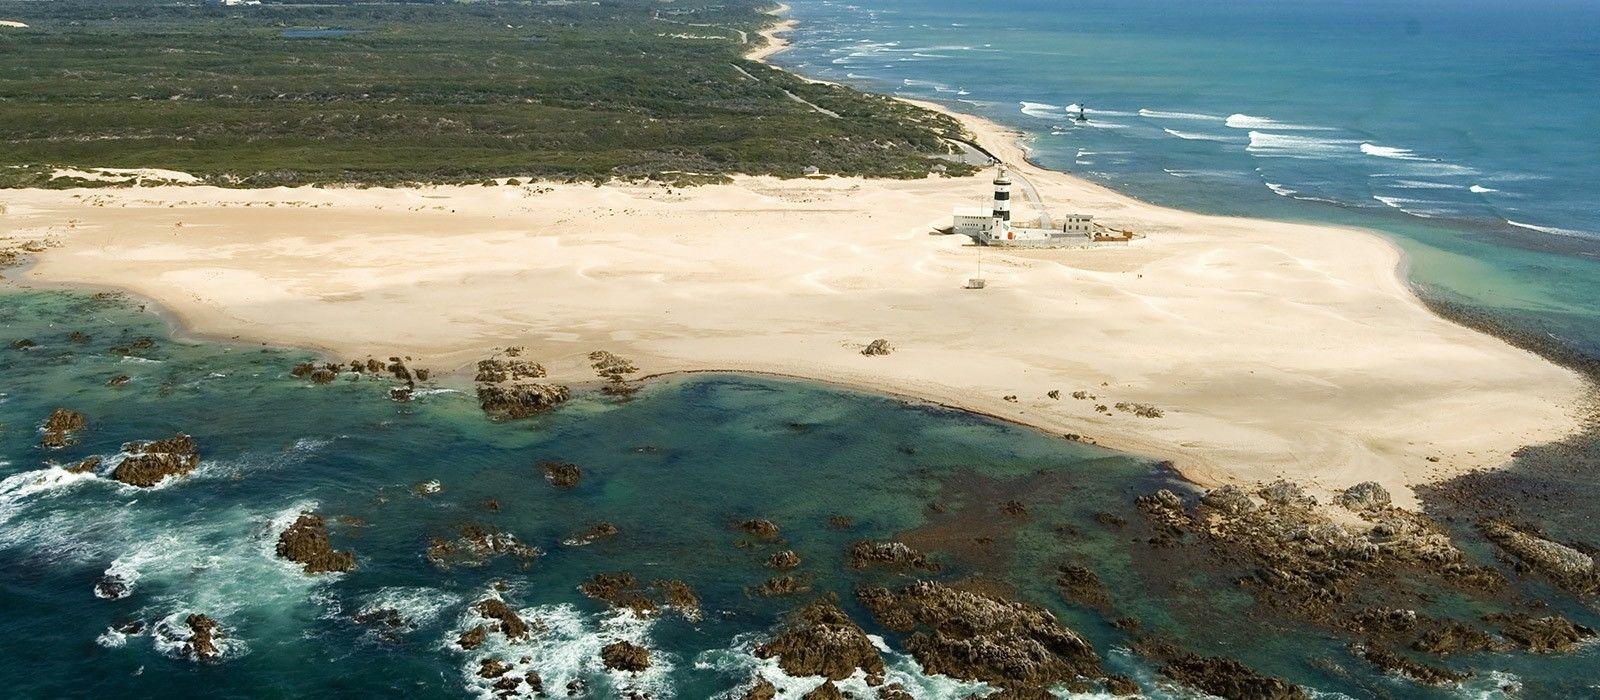 Destination Port Elizabeth South Africa